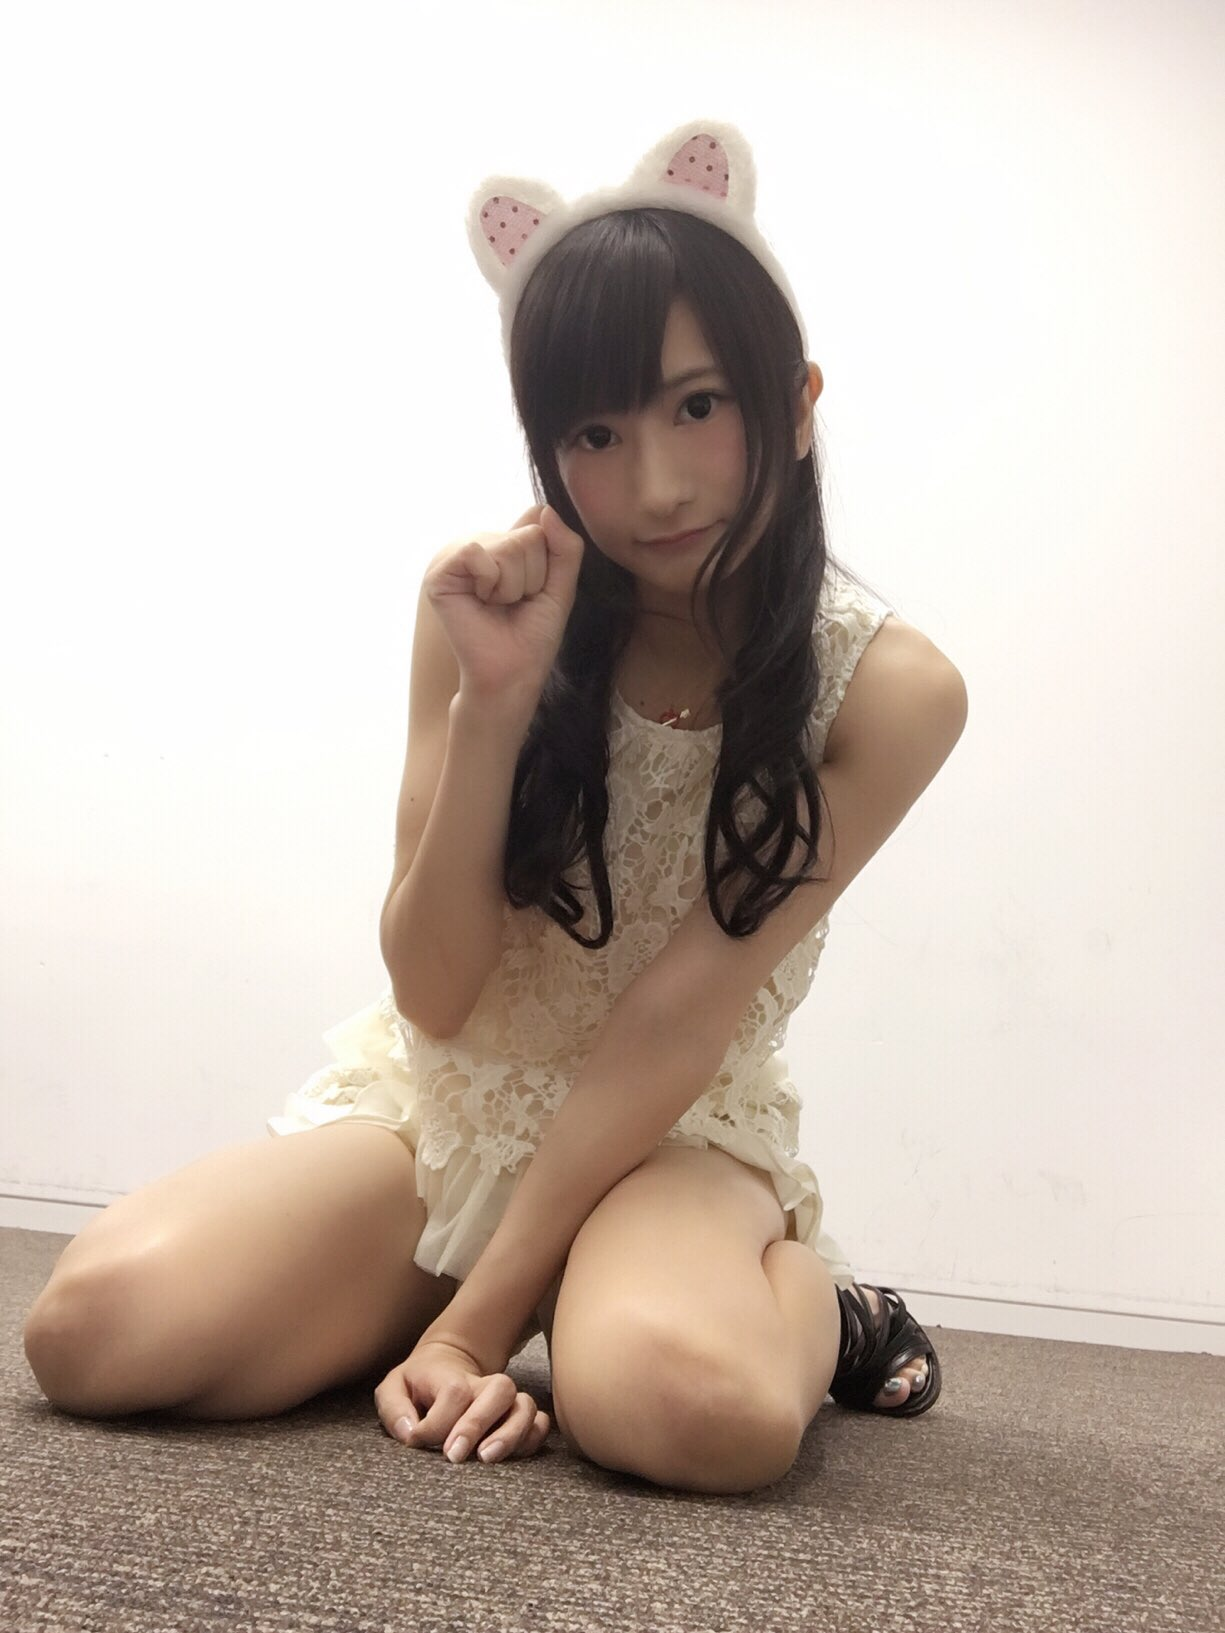 A-Pop Idols 298793 | Tonosaki ...